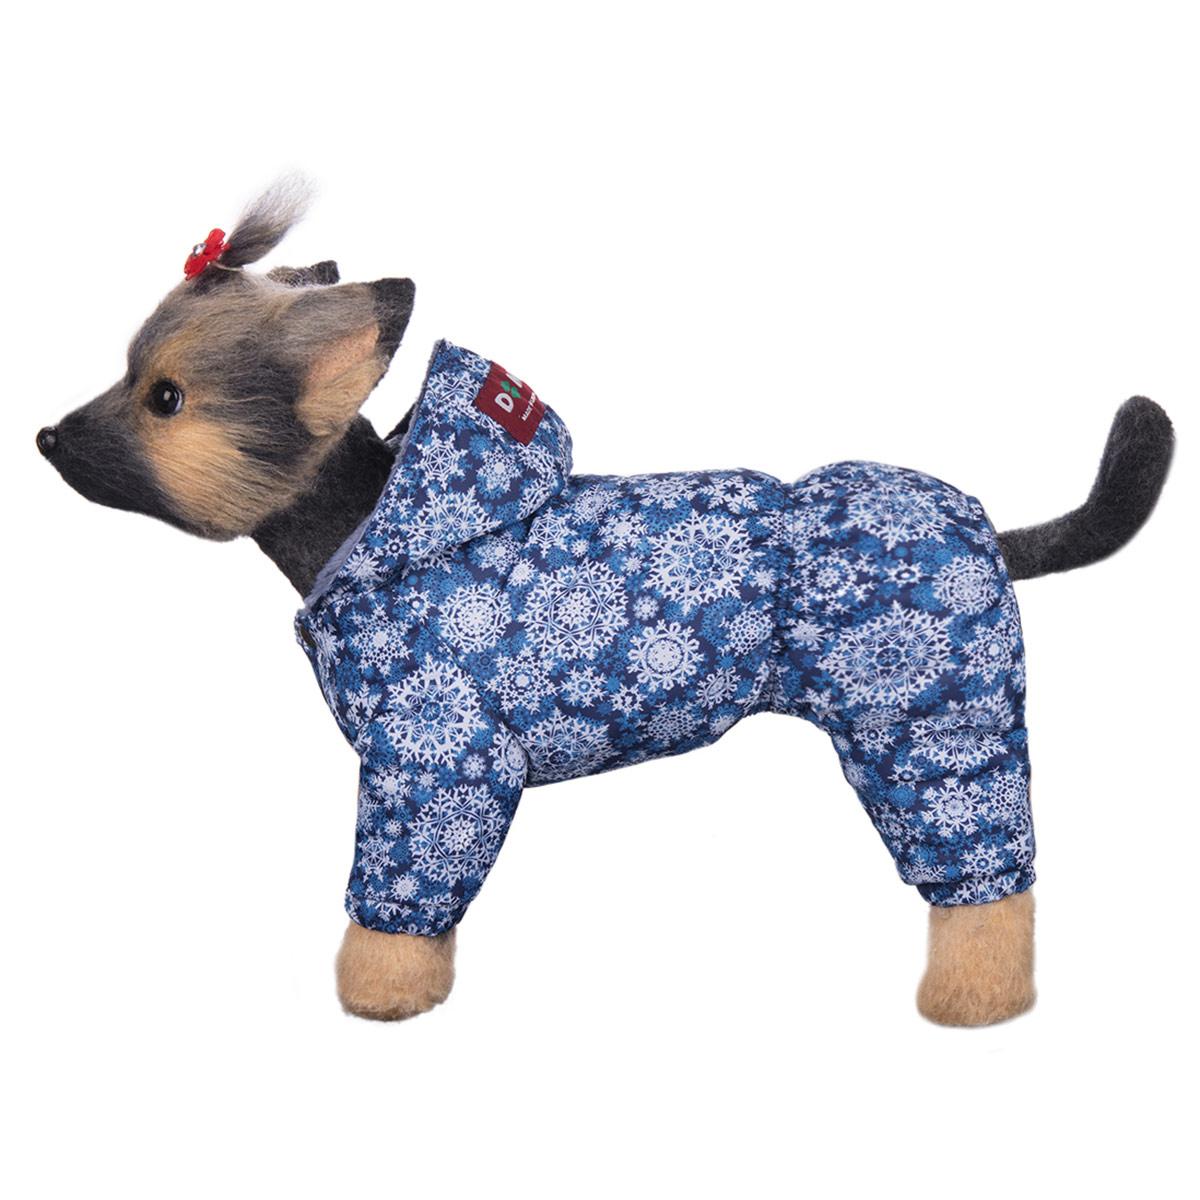 Комбинезон для собак Dogmoda Зима, для мальчика. Размер 3 (L)